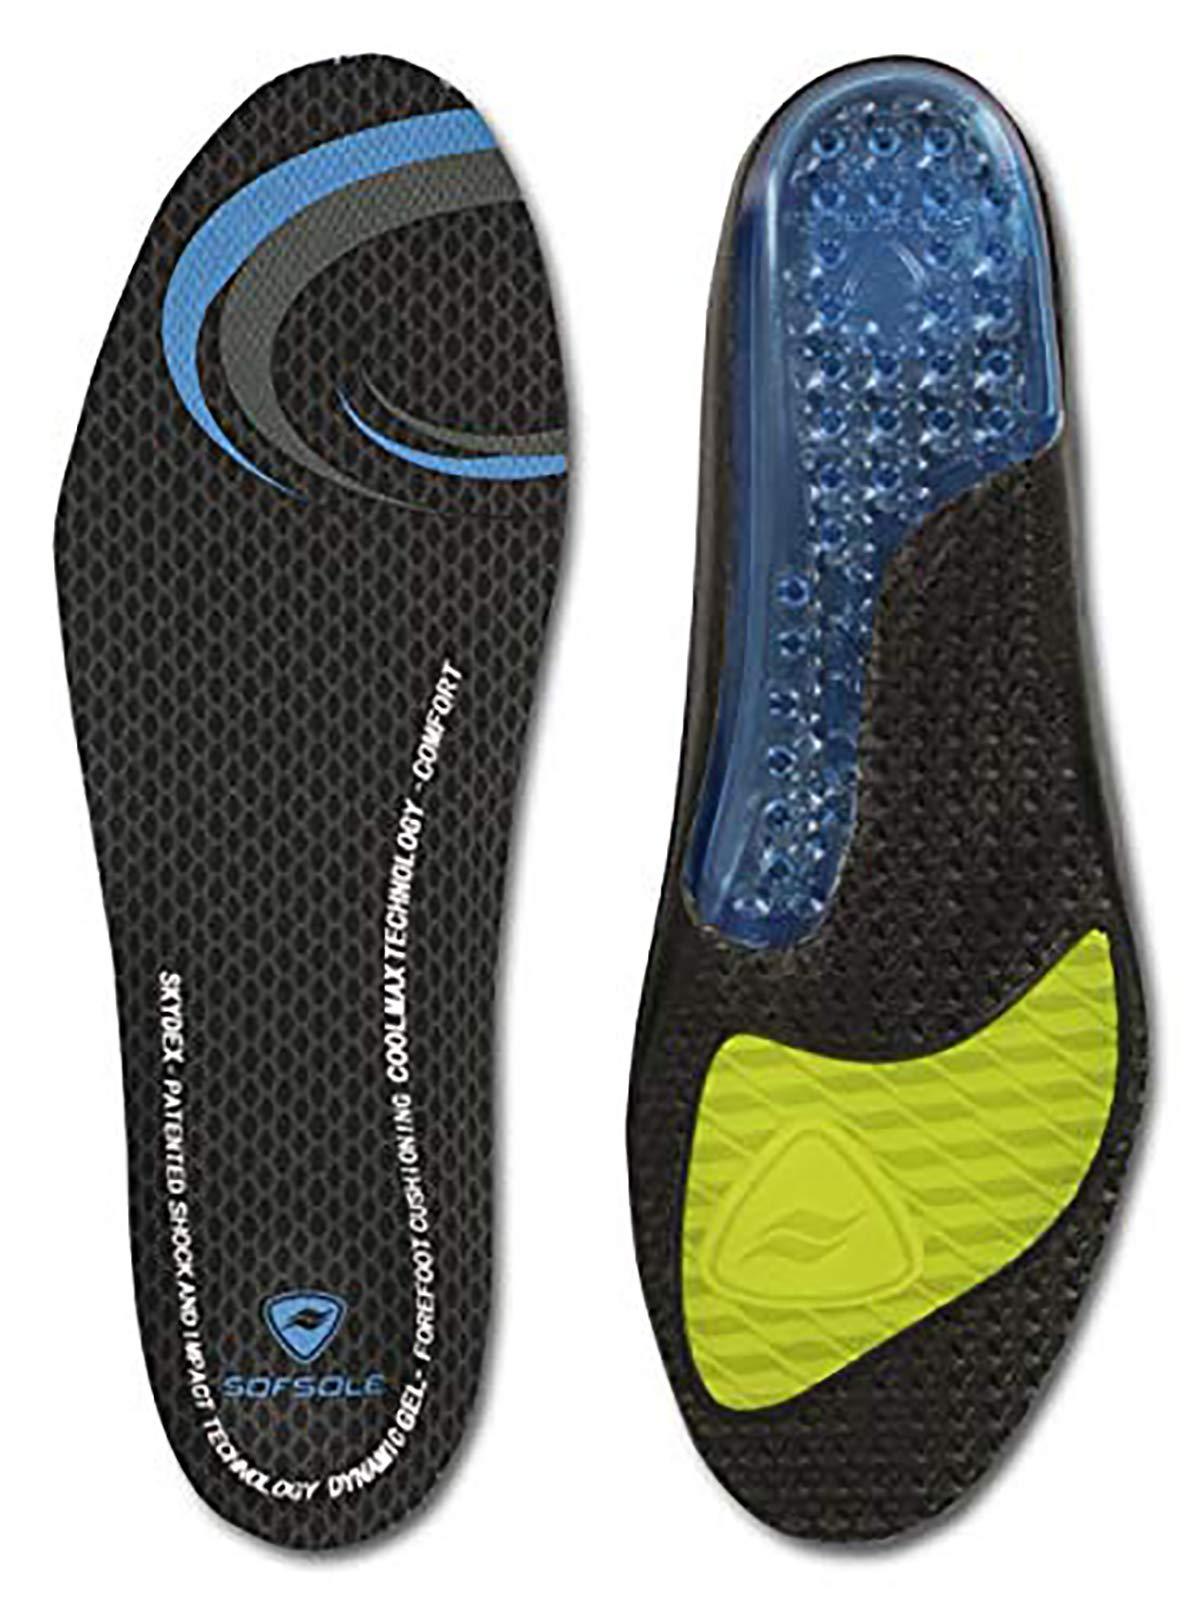 Sof Sole Women's Airr Full Length Performance Gel Shoe Insole, Women's Size 8-11 Black